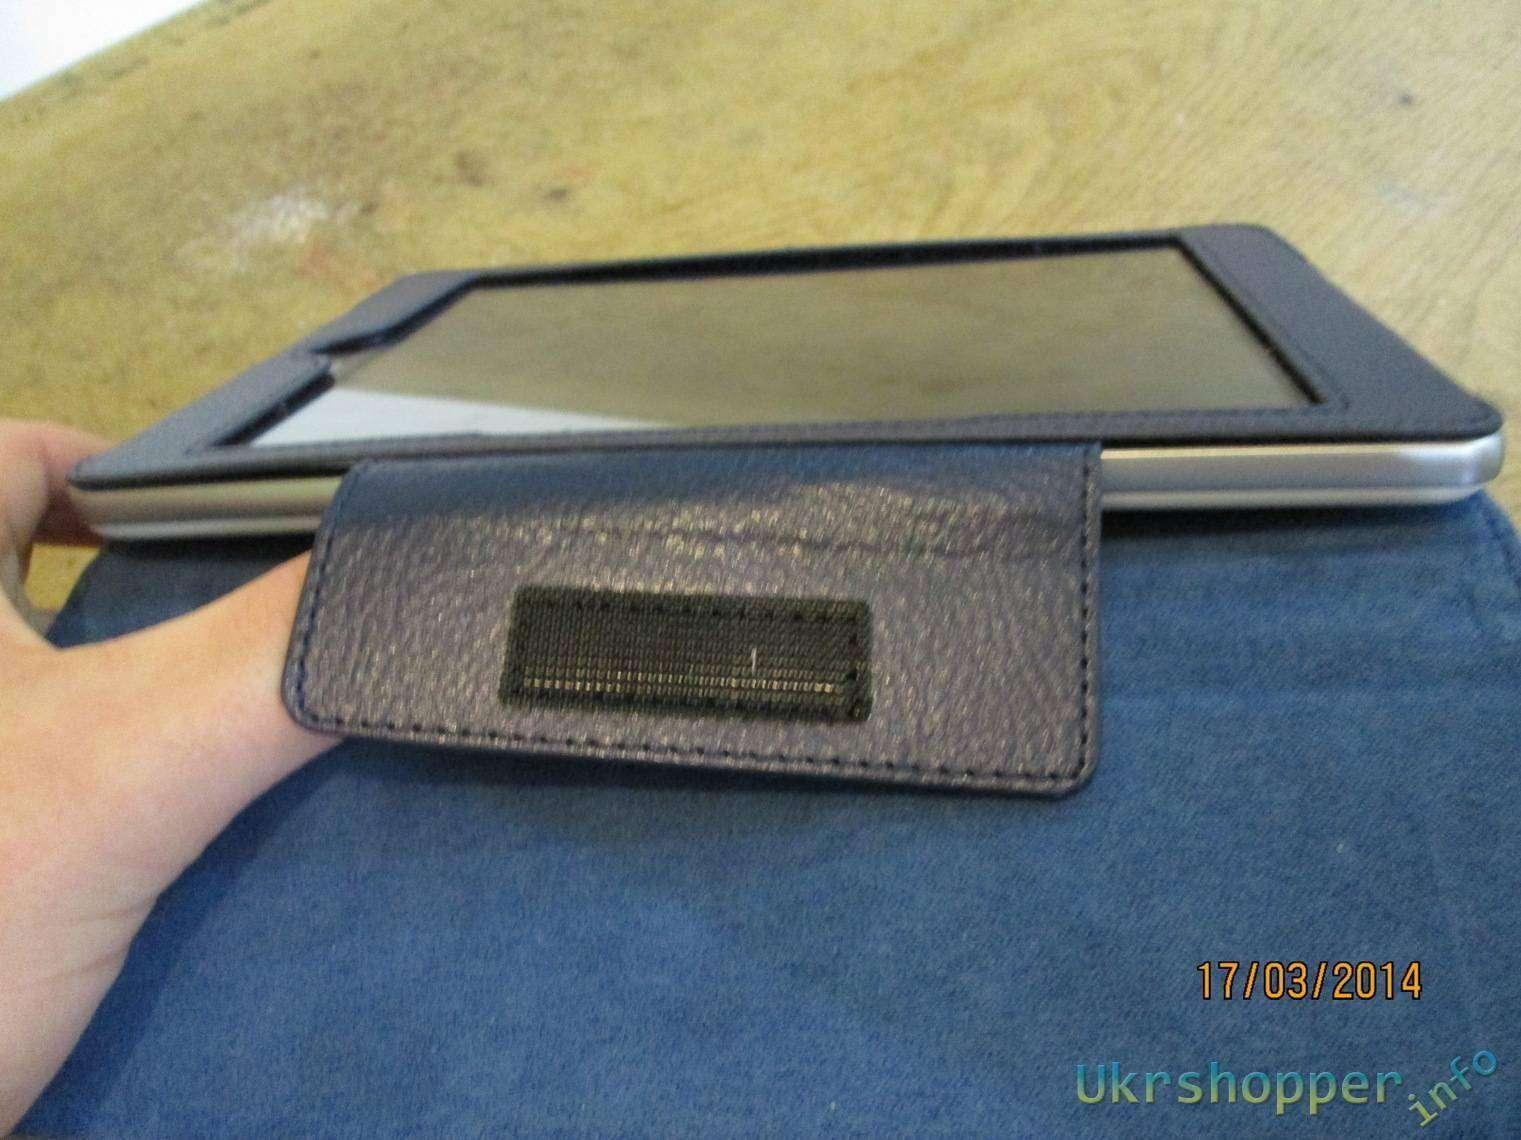 Ebay: Шкурка для acer iconia A1-810/811